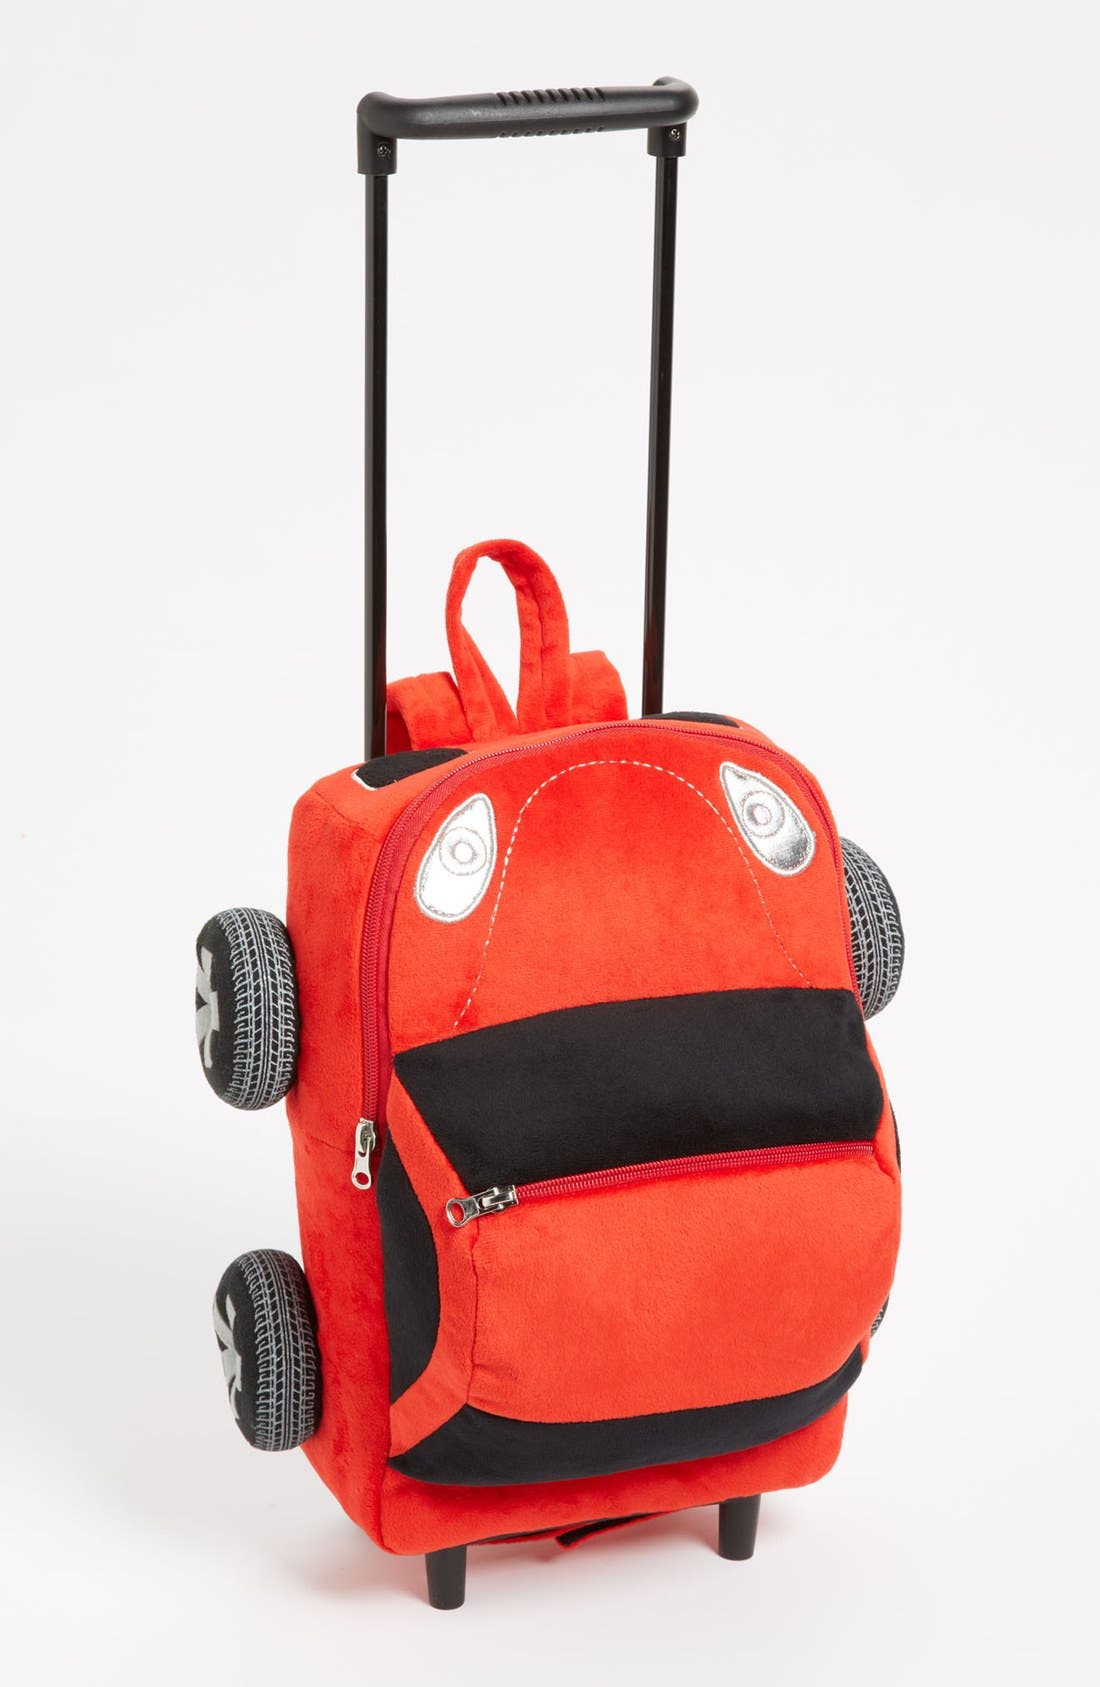 Alternate Image 1 Selected - Popatu 'Red Car' Rolling Backpack (Toddler Boys)